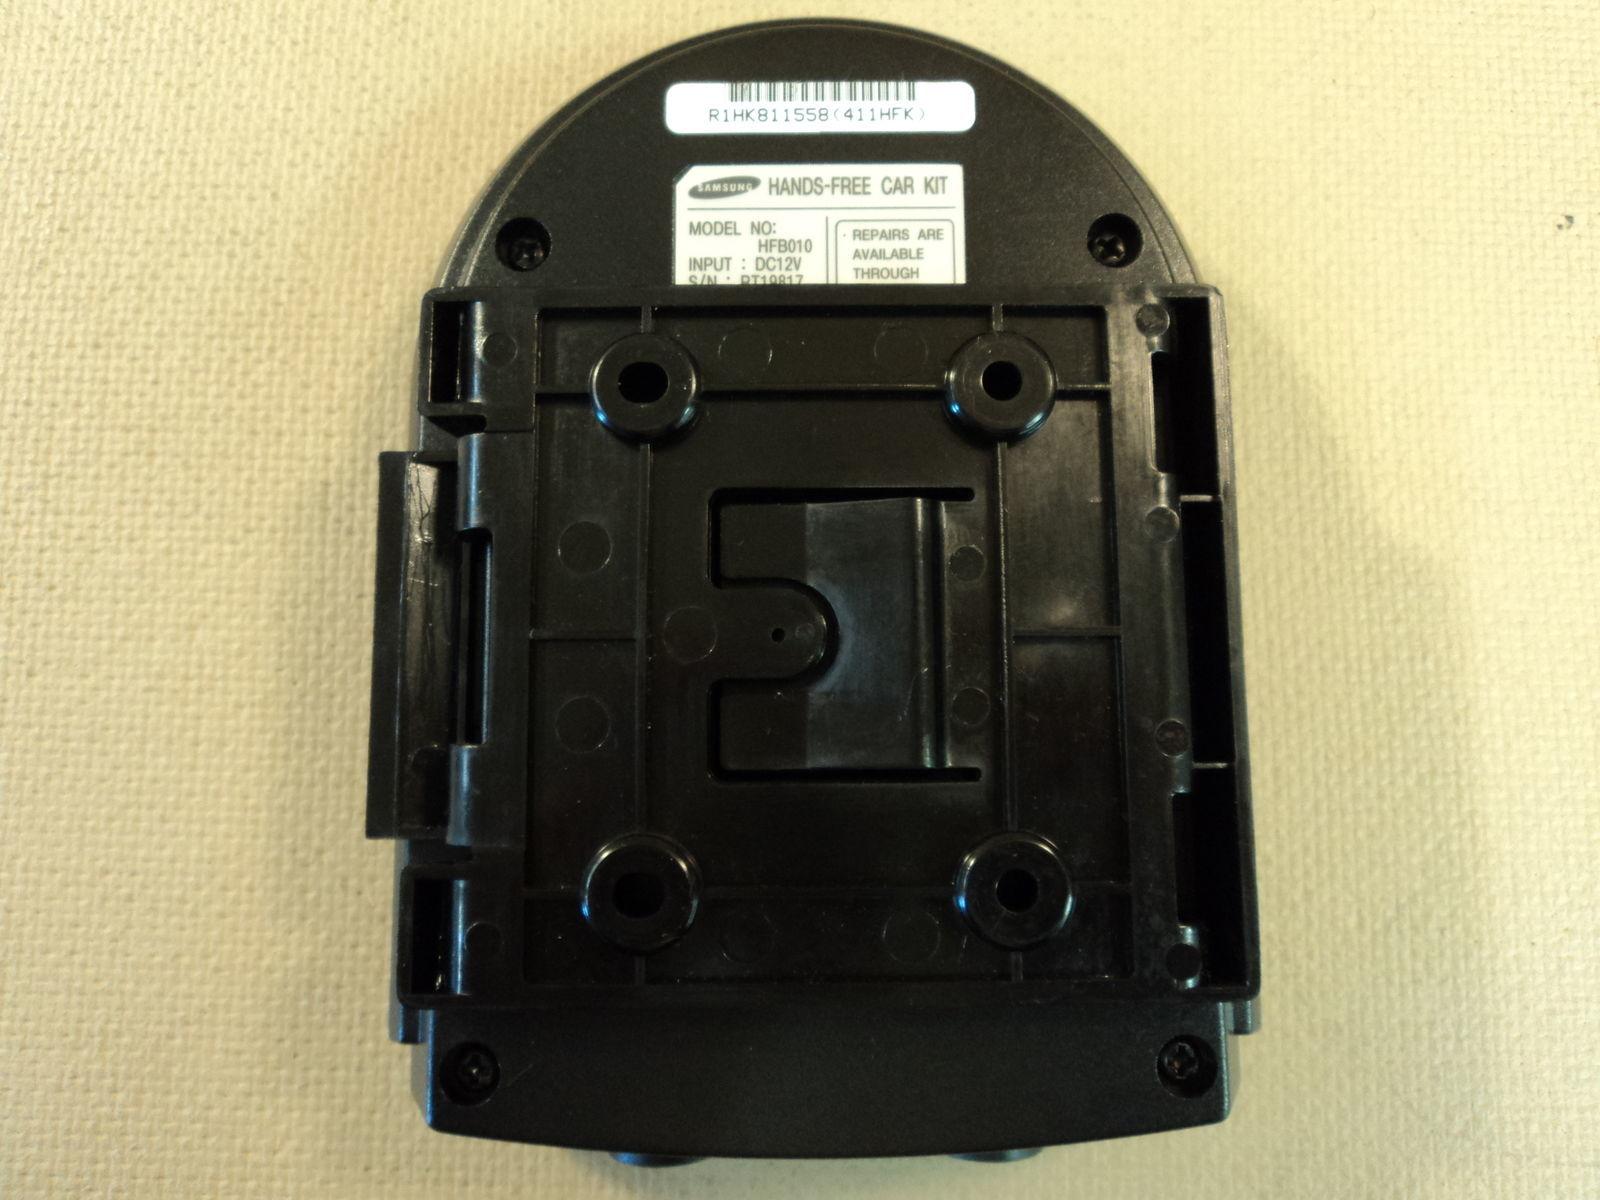 Samsung Hands Free Car Kit With Speaker Black Phone Cradle HFB010